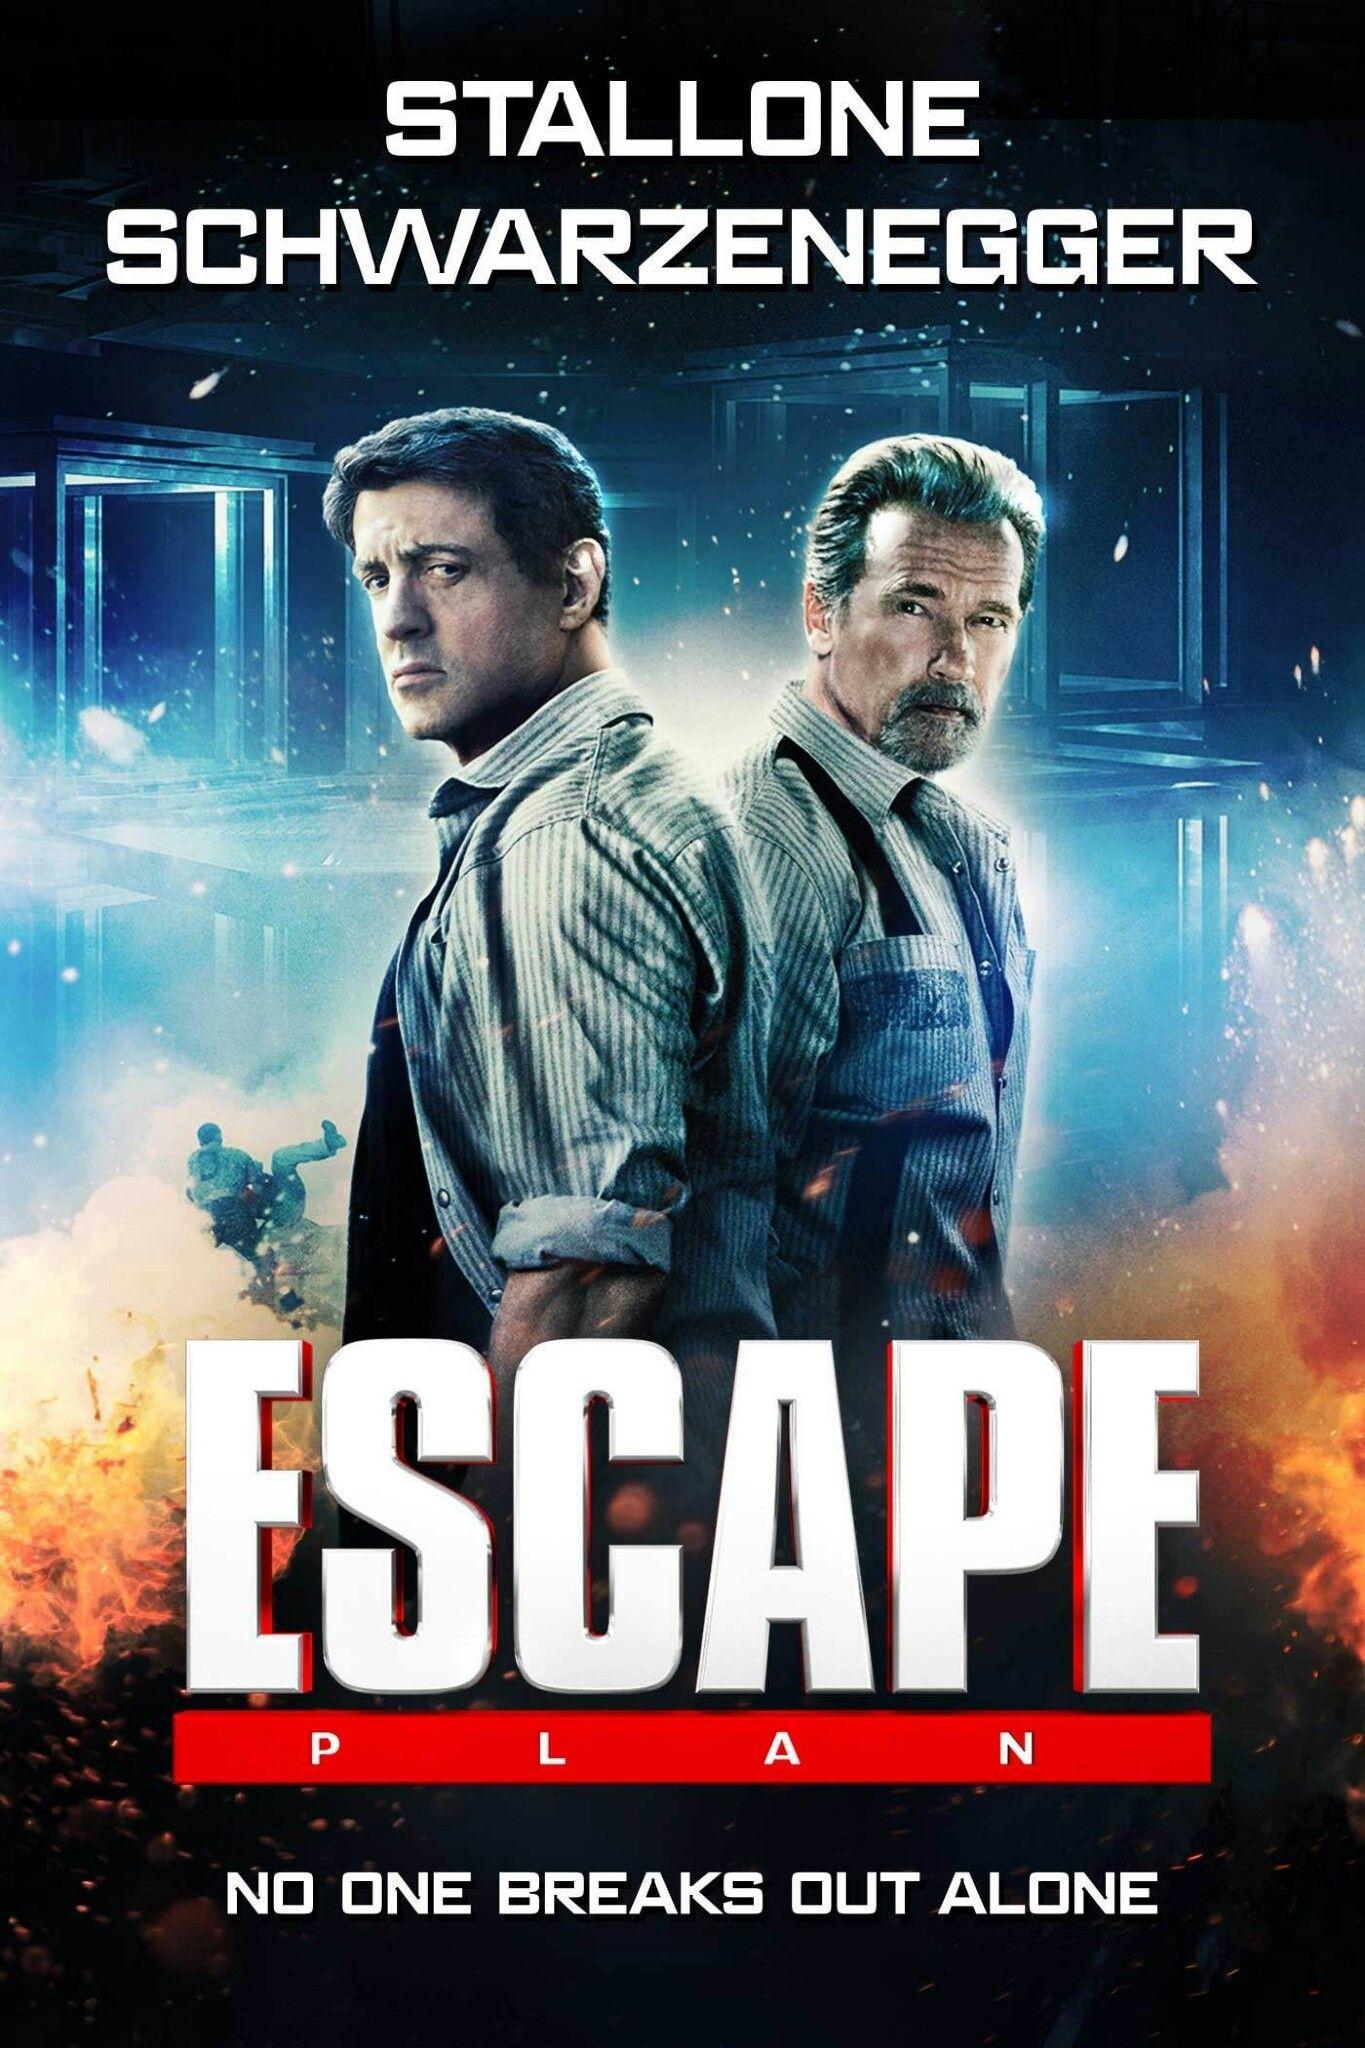 Escape Plan Movie Poster Fantastic Movie Posters Scifi Movie Posters Horror Movie Posters Action Movie Posters Drama M Plan Movie Escape Plan Movie Posters